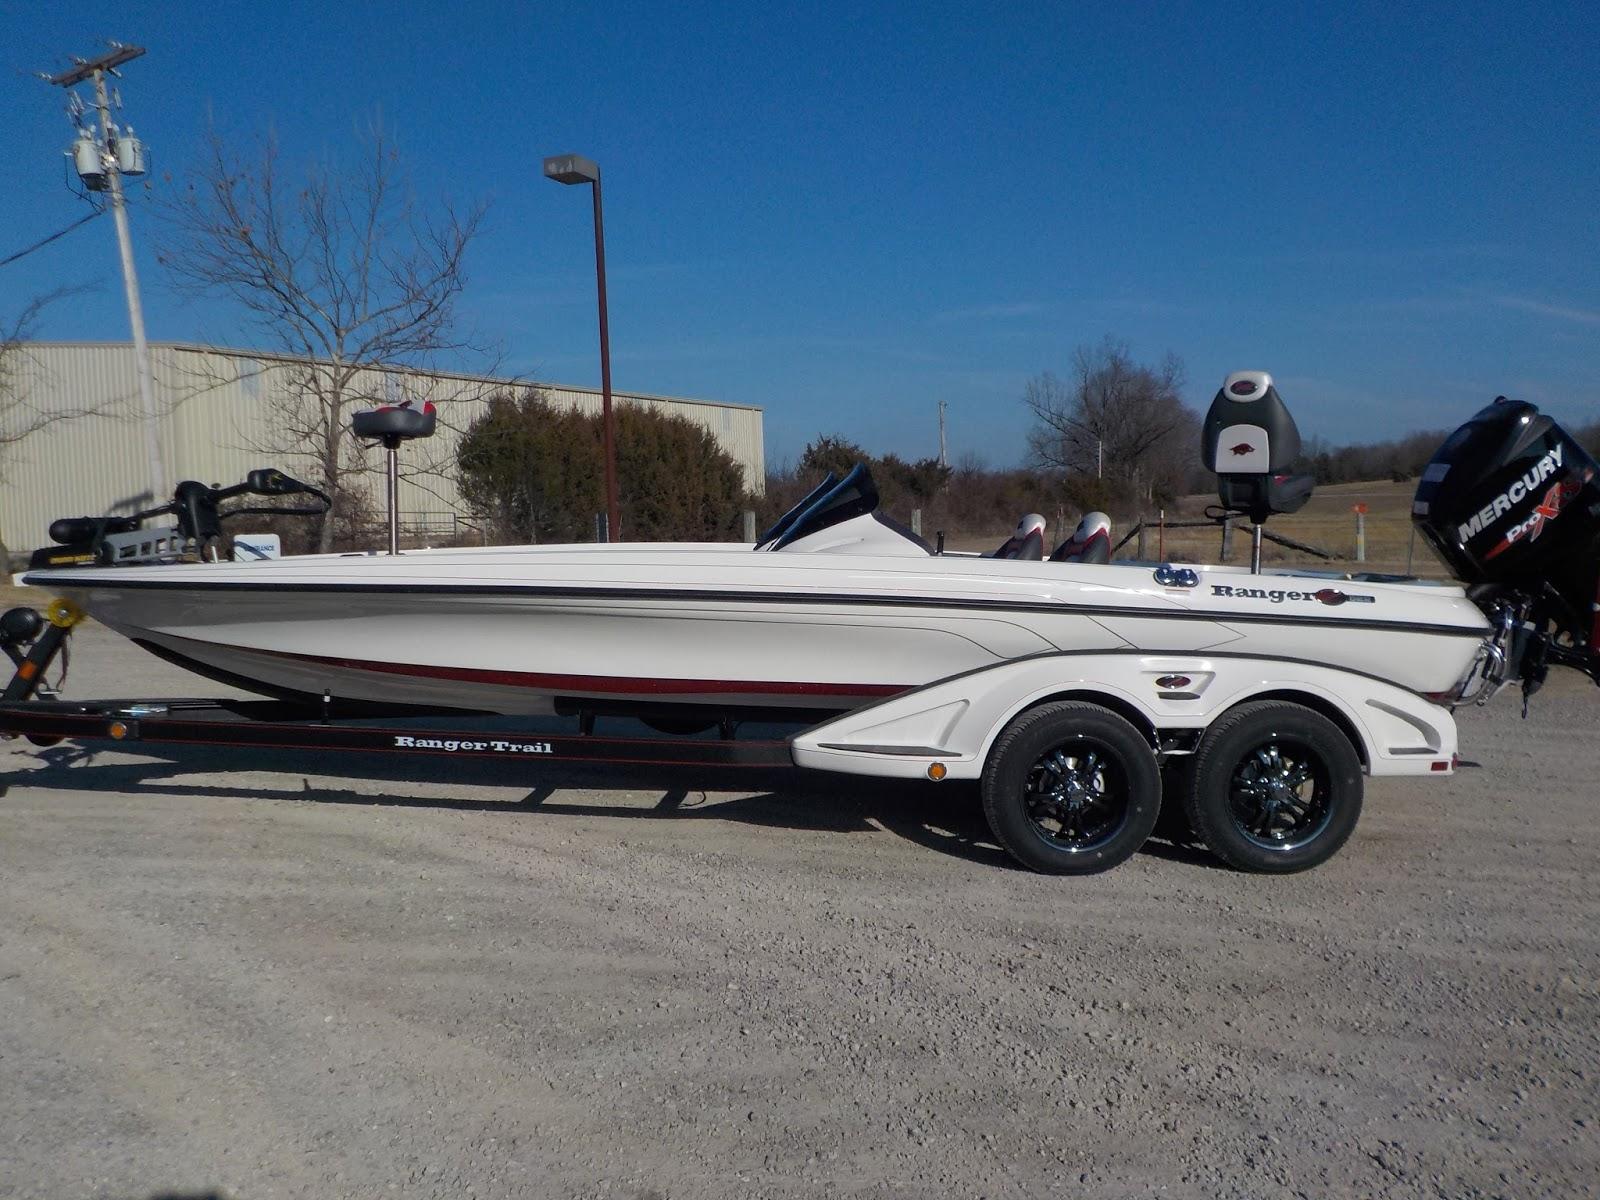 Ranger Boats Blog: Country Music Star Justin Moore & His New Ranger!